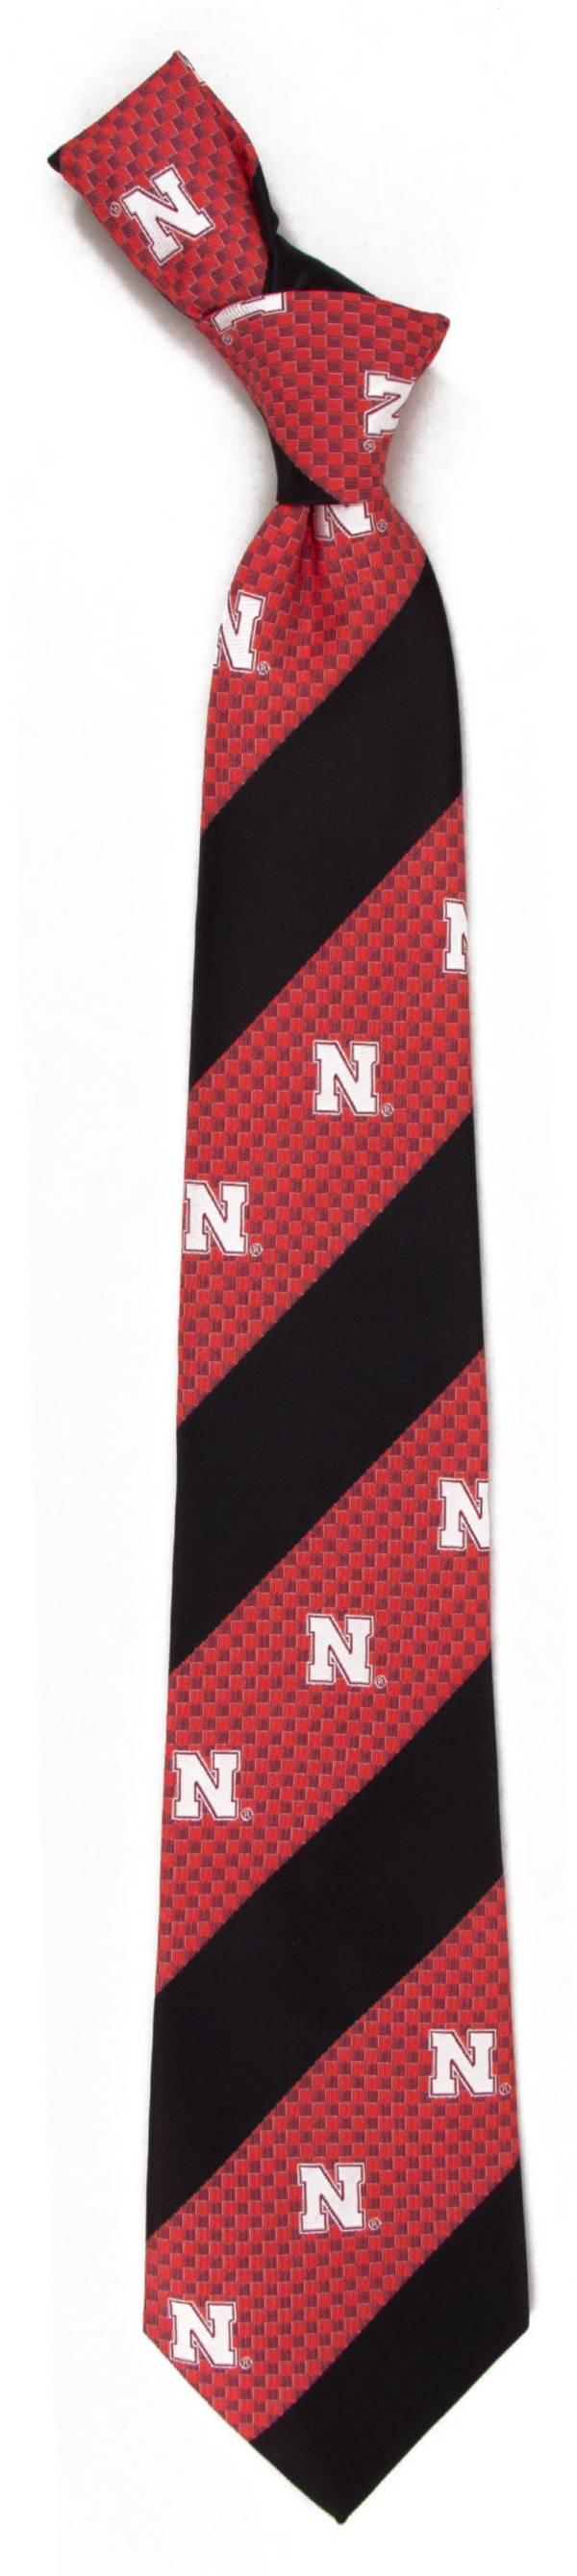 Eagles Wings Nebraska Cornhuskers Geo Stripe Necktie product image